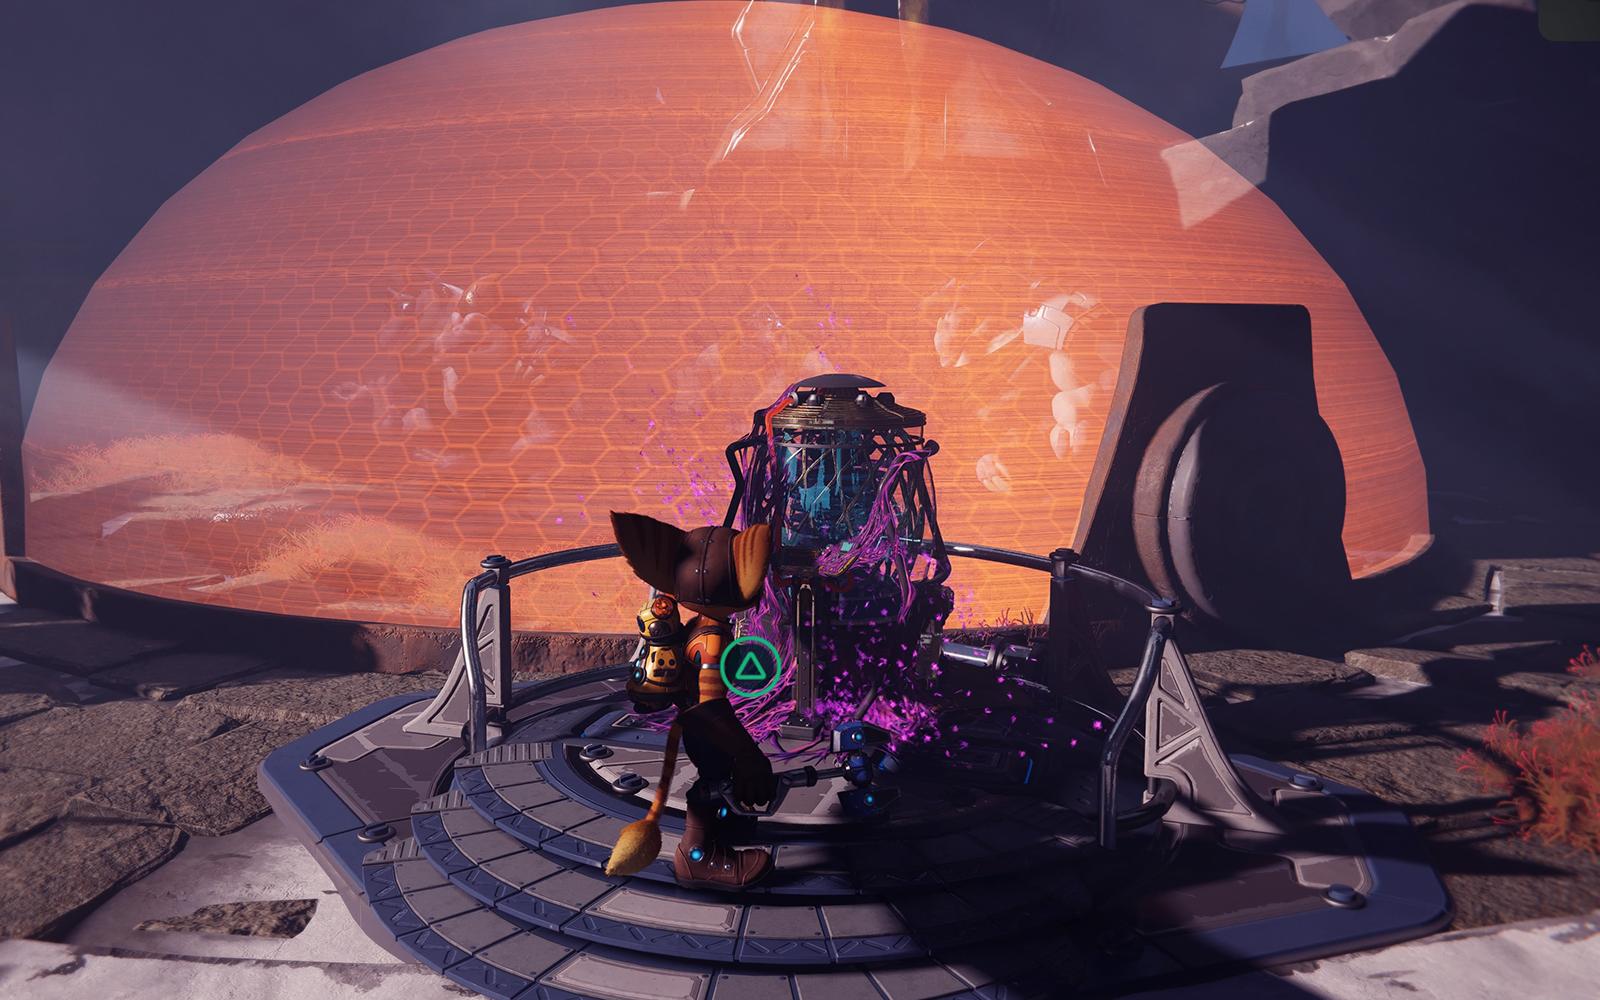 Ratchet & Clank Rift Apart Planet 4